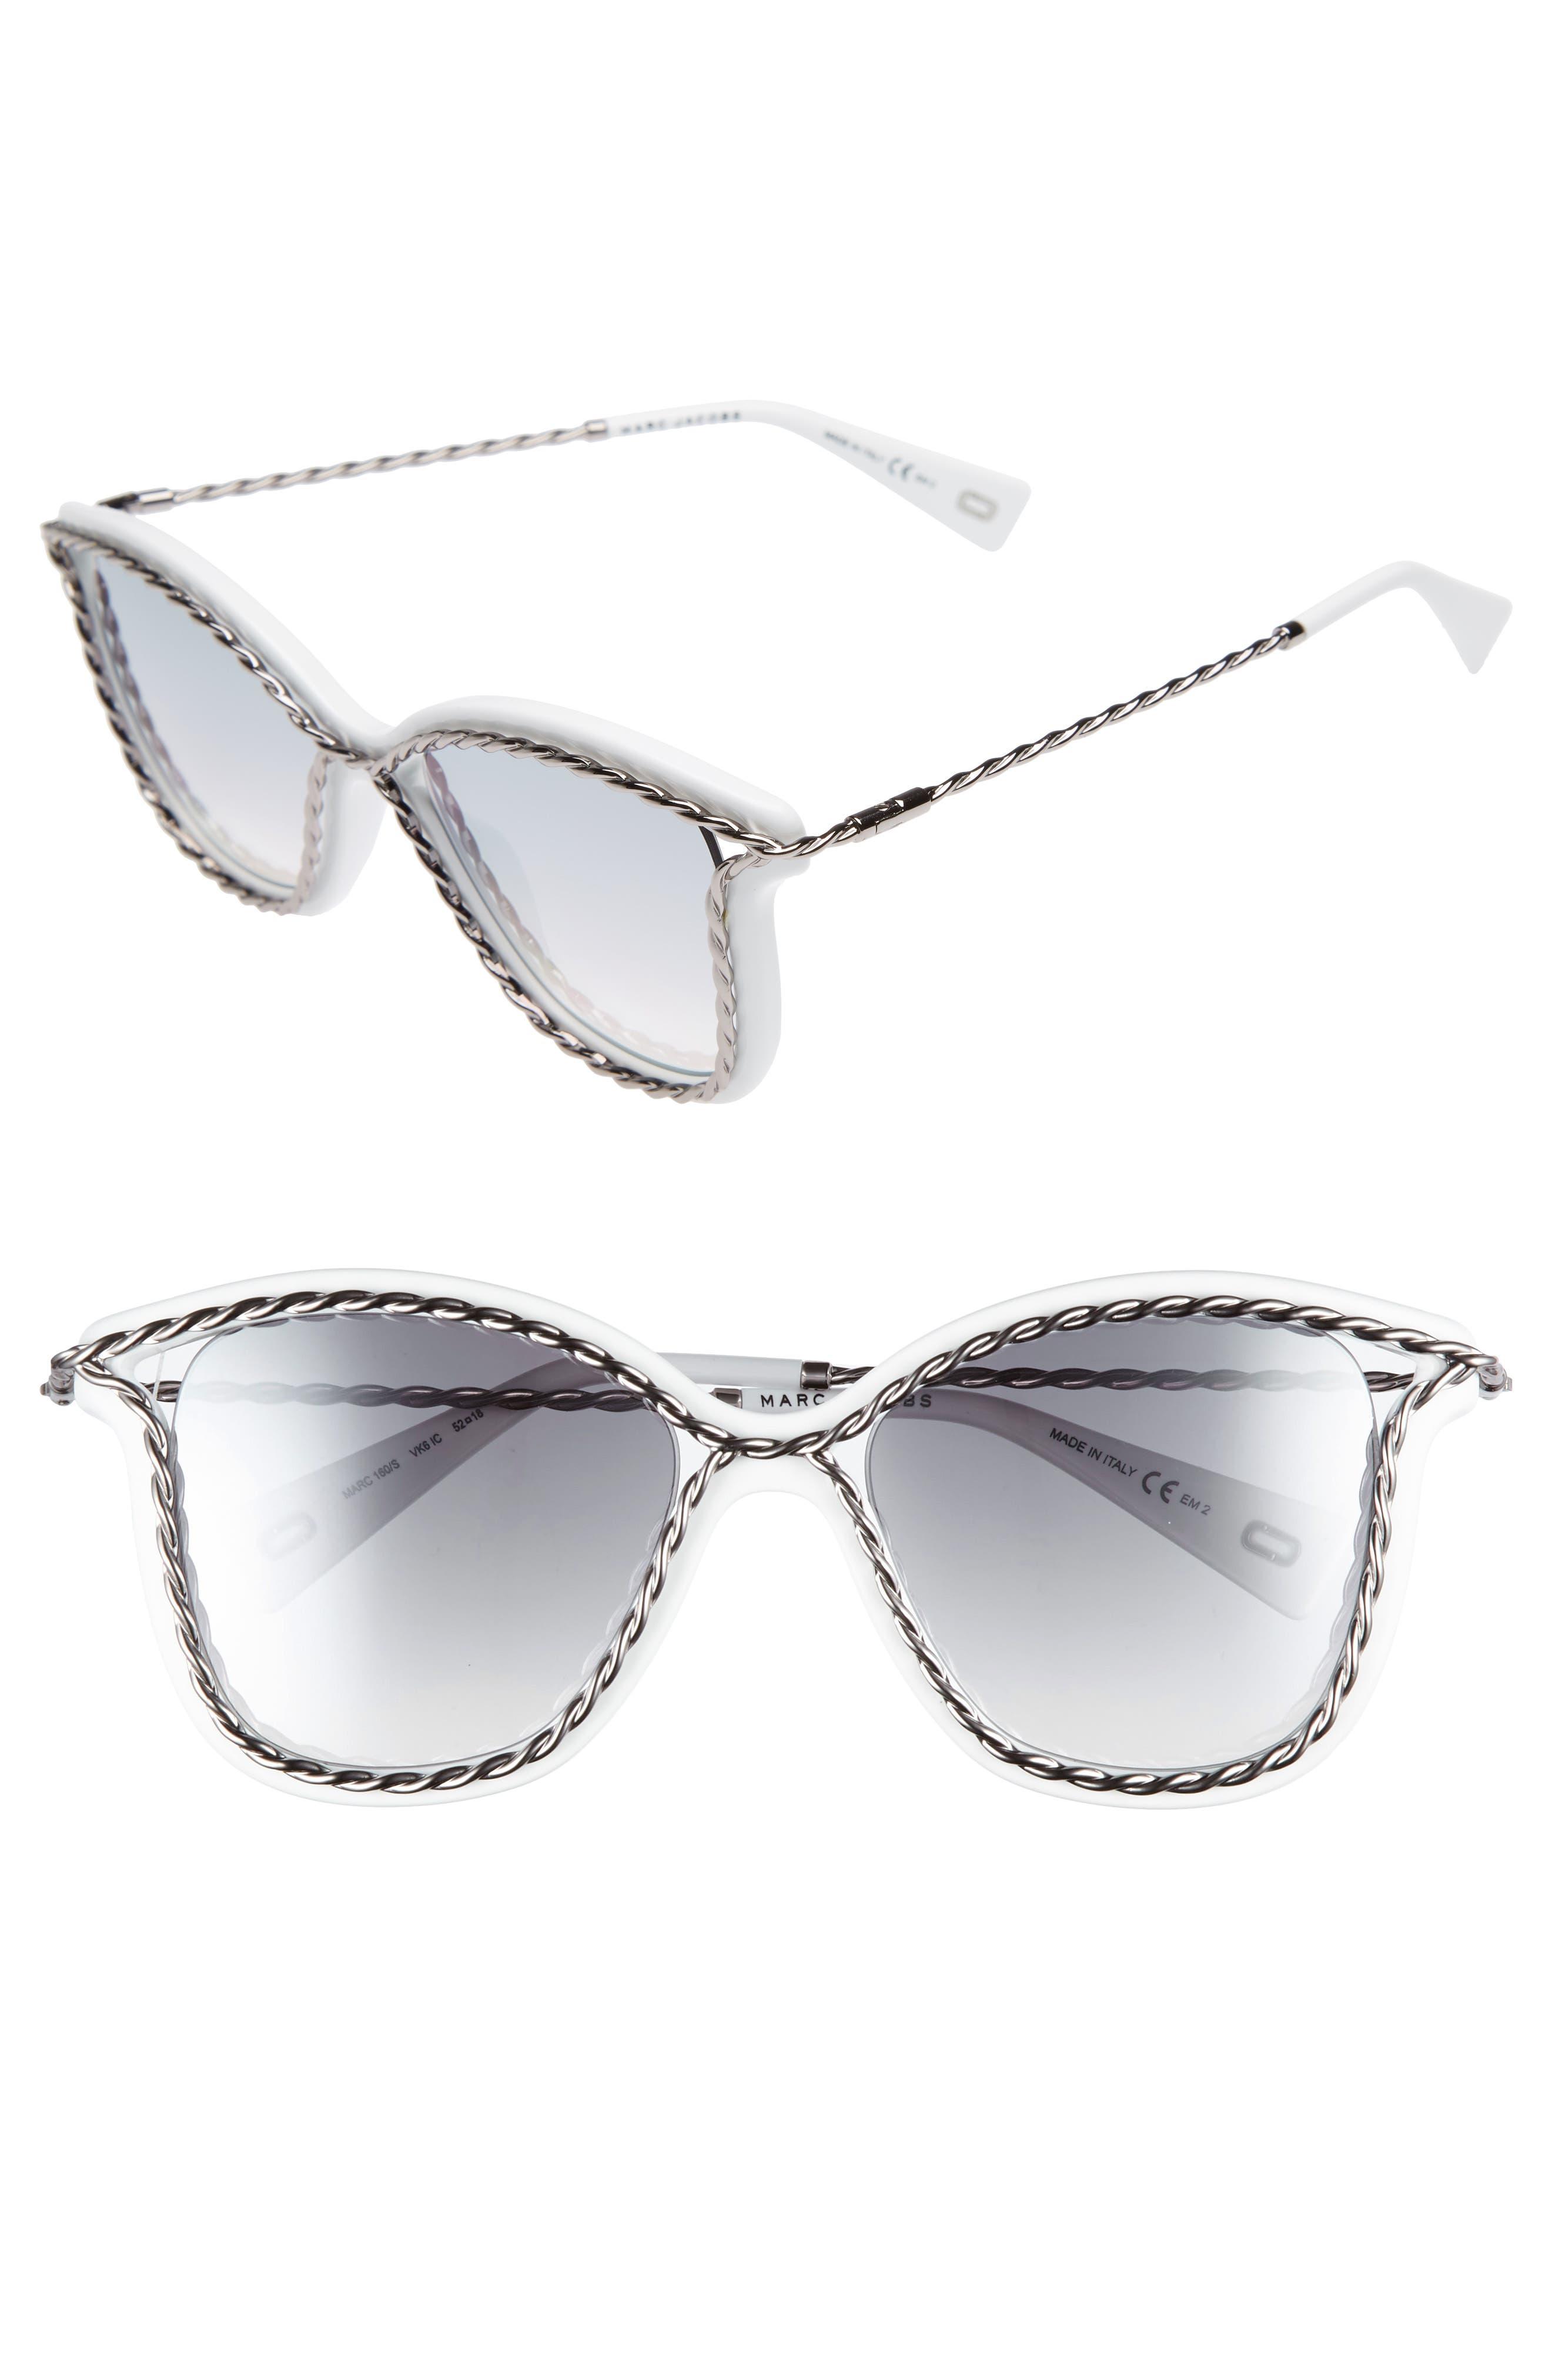 52mm Cat Eye Sunglasses,                         Main,                         color, White